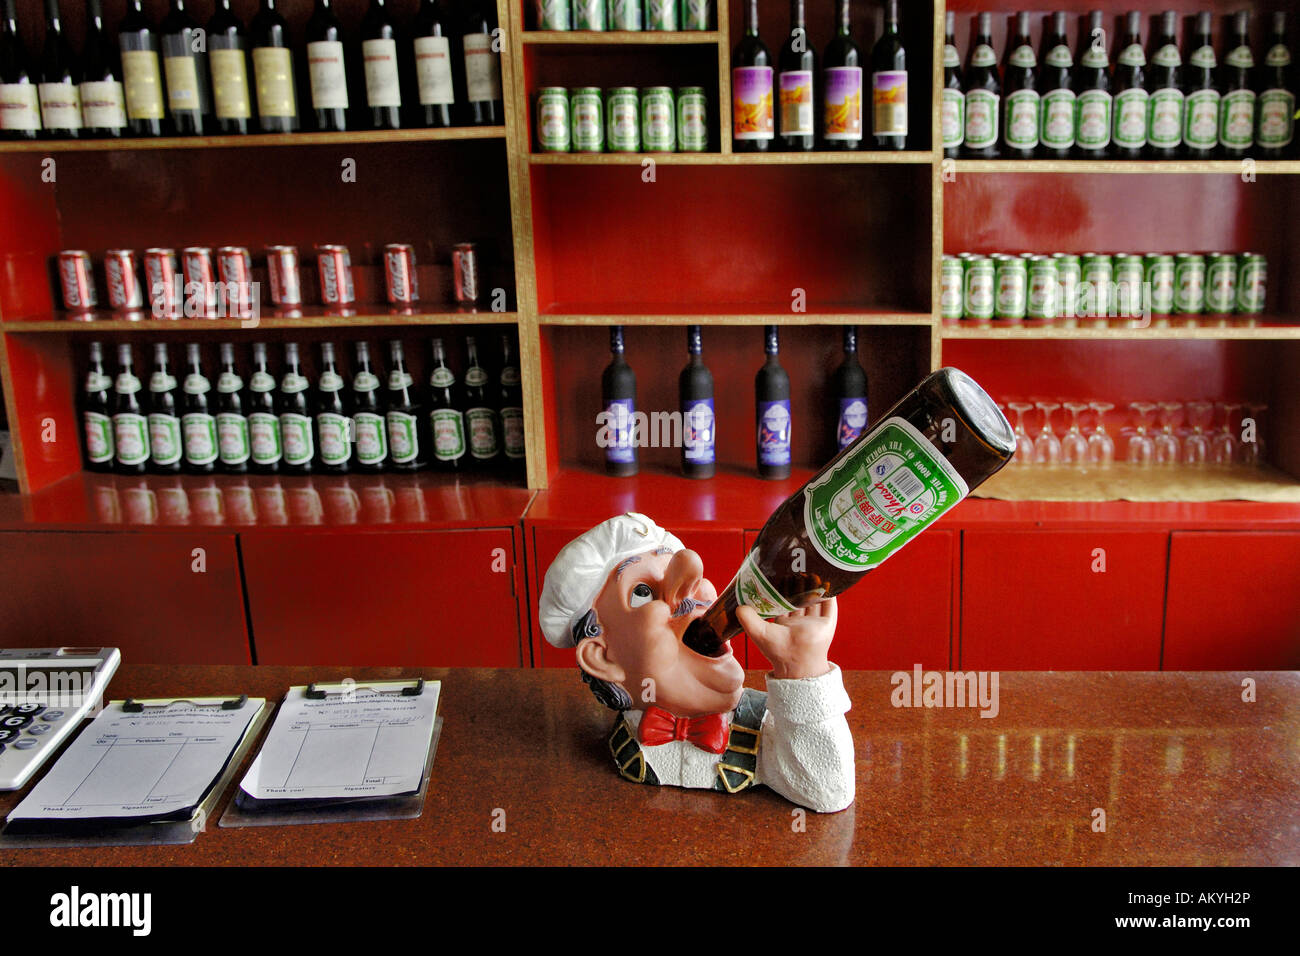 Lustige Bier Werbung, Lhasa, Tibet Stockfoto, Bild ...